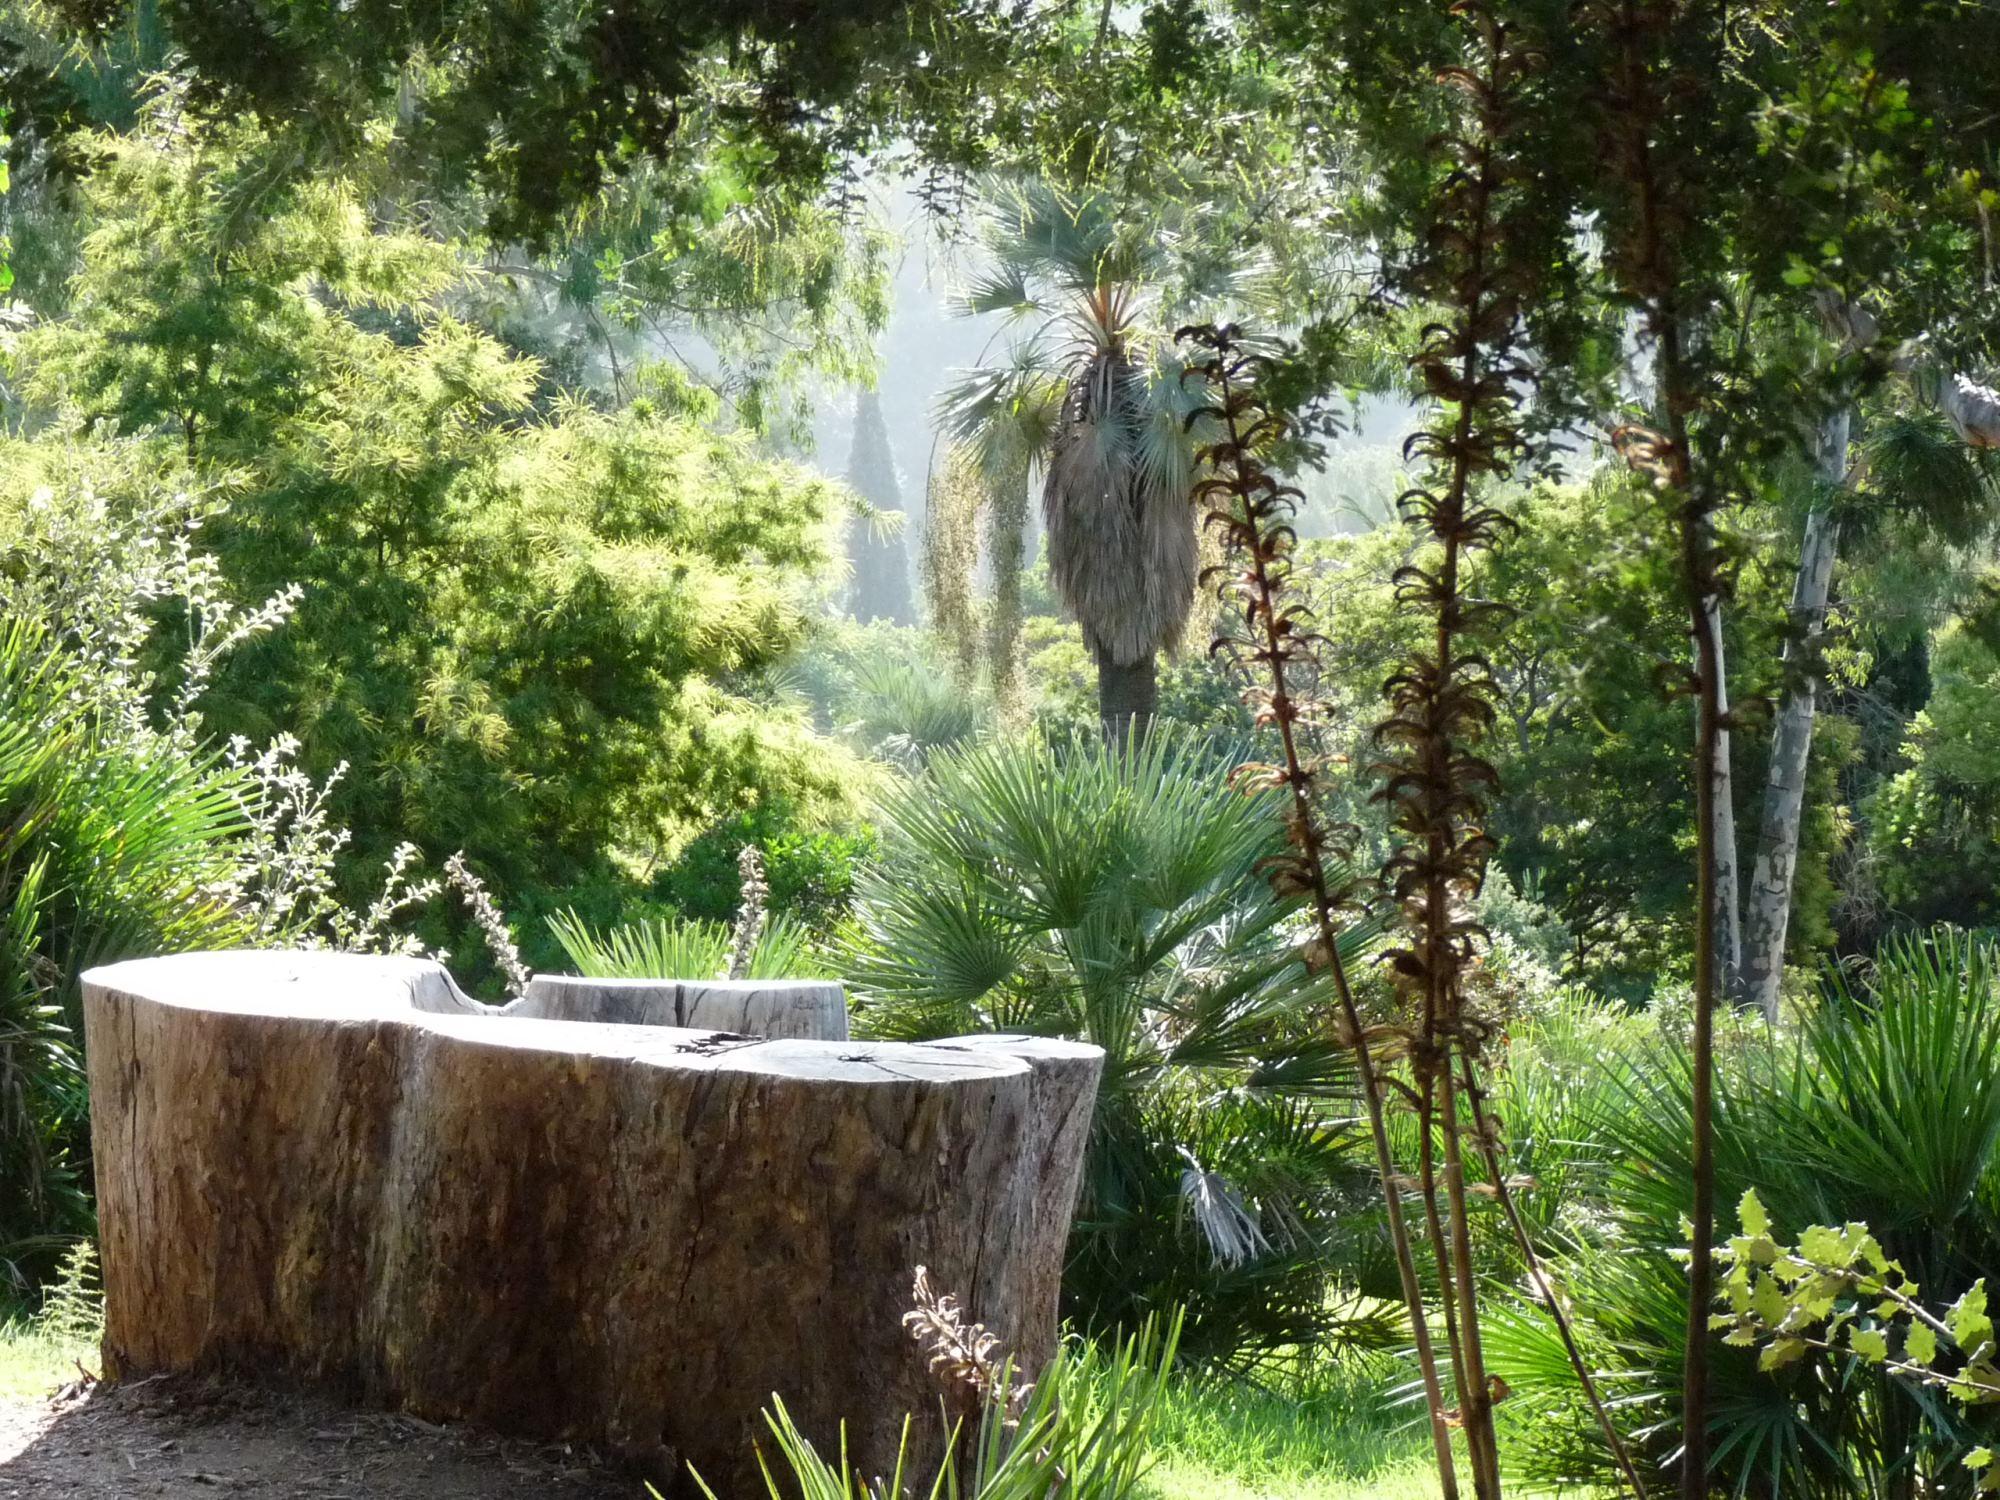 Domaine du rayol le jardin des m diterran es sorties for Jardin rayol canadel